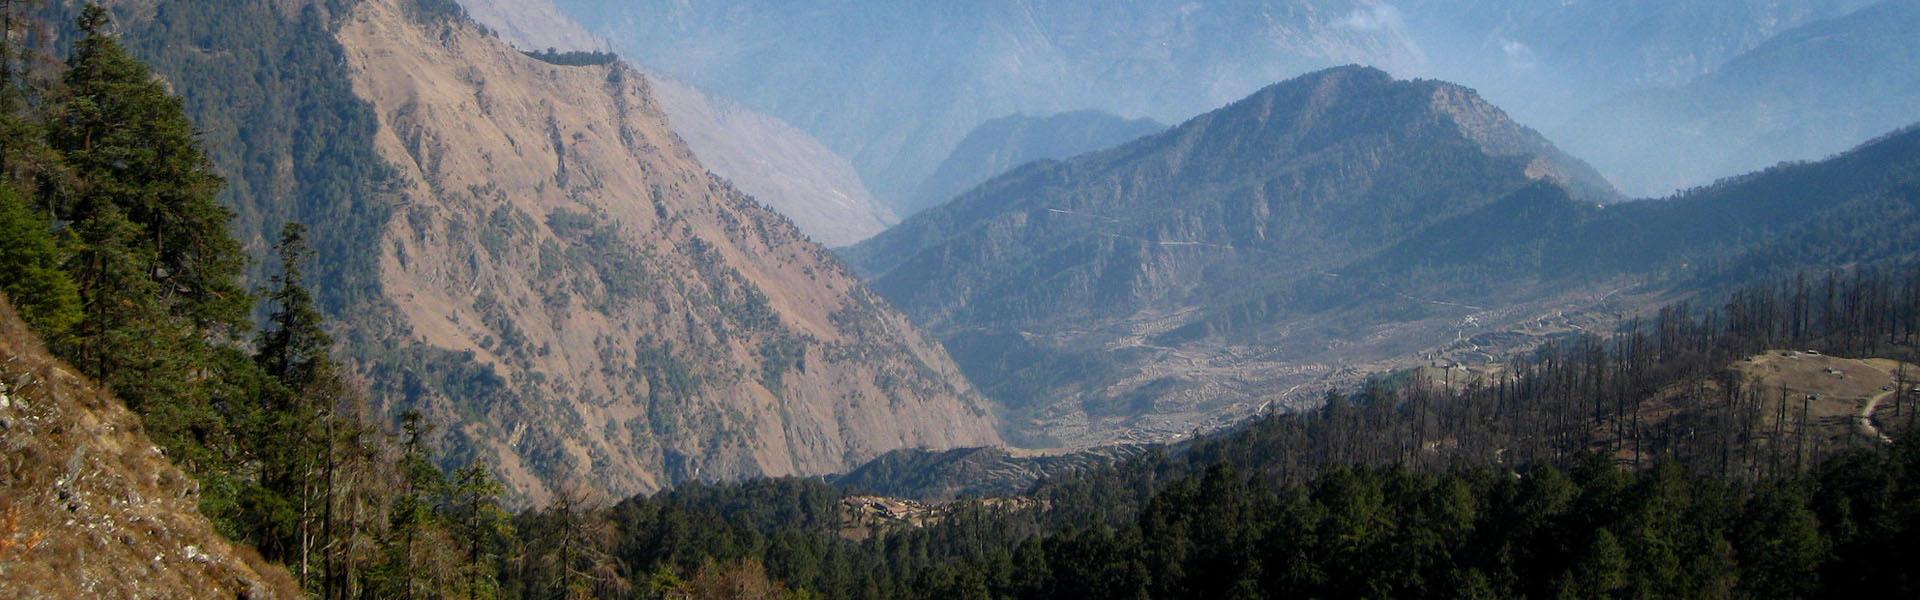 ruby valley trek